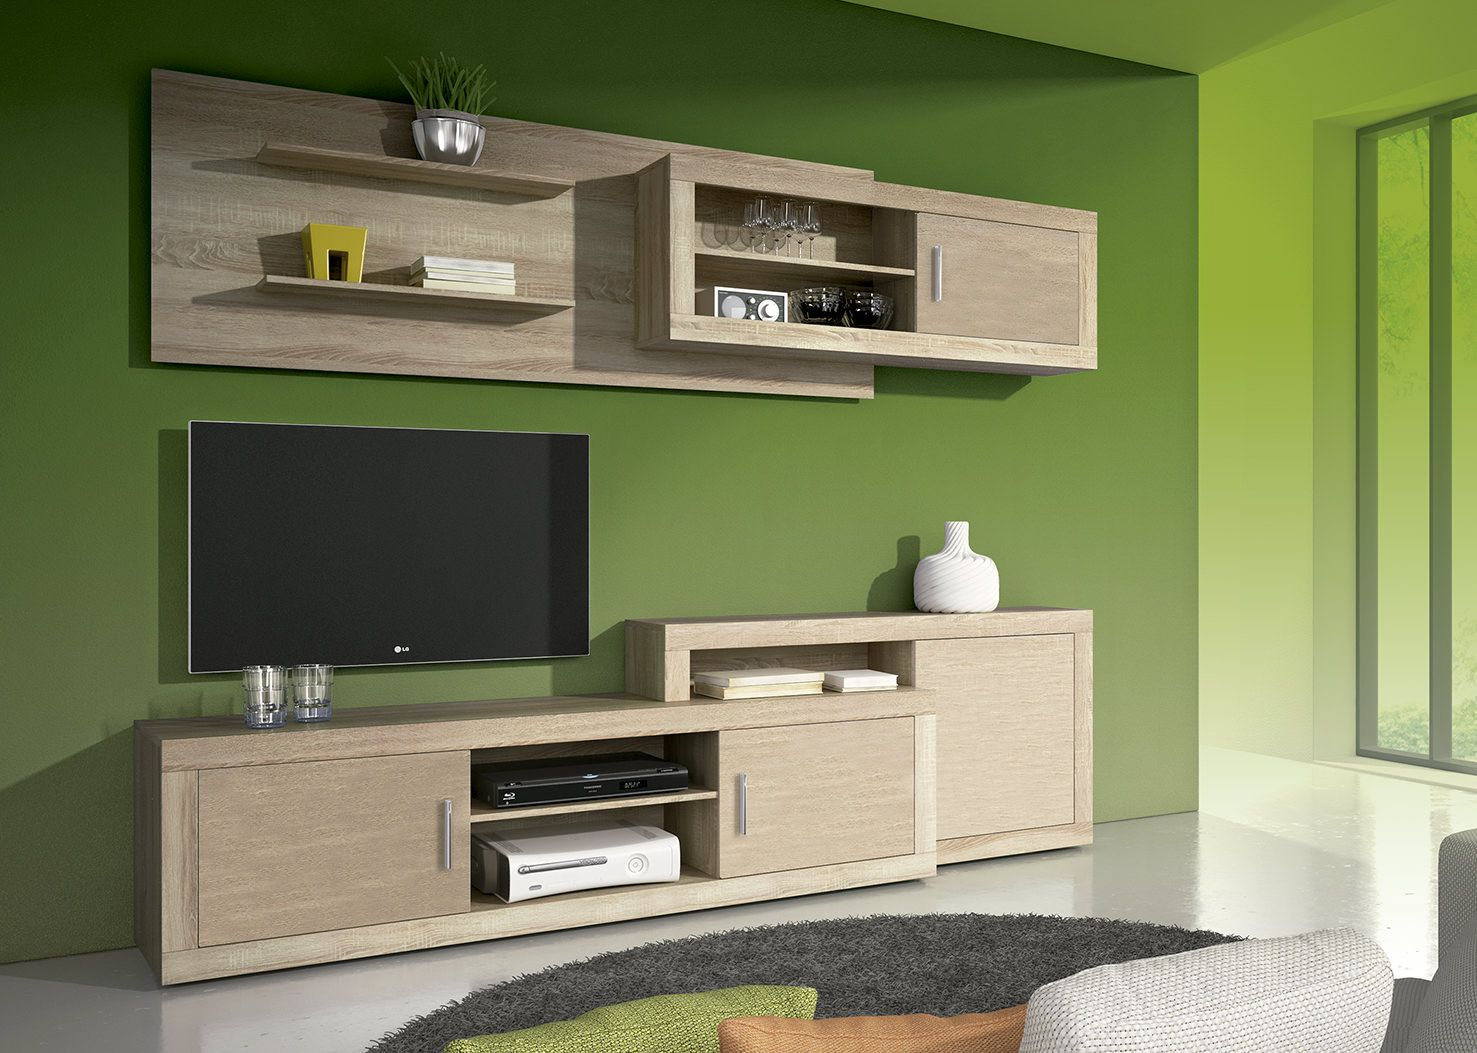 Muebles low cost obtenga ideas dise o de muebles para su - Muebles low cost ...